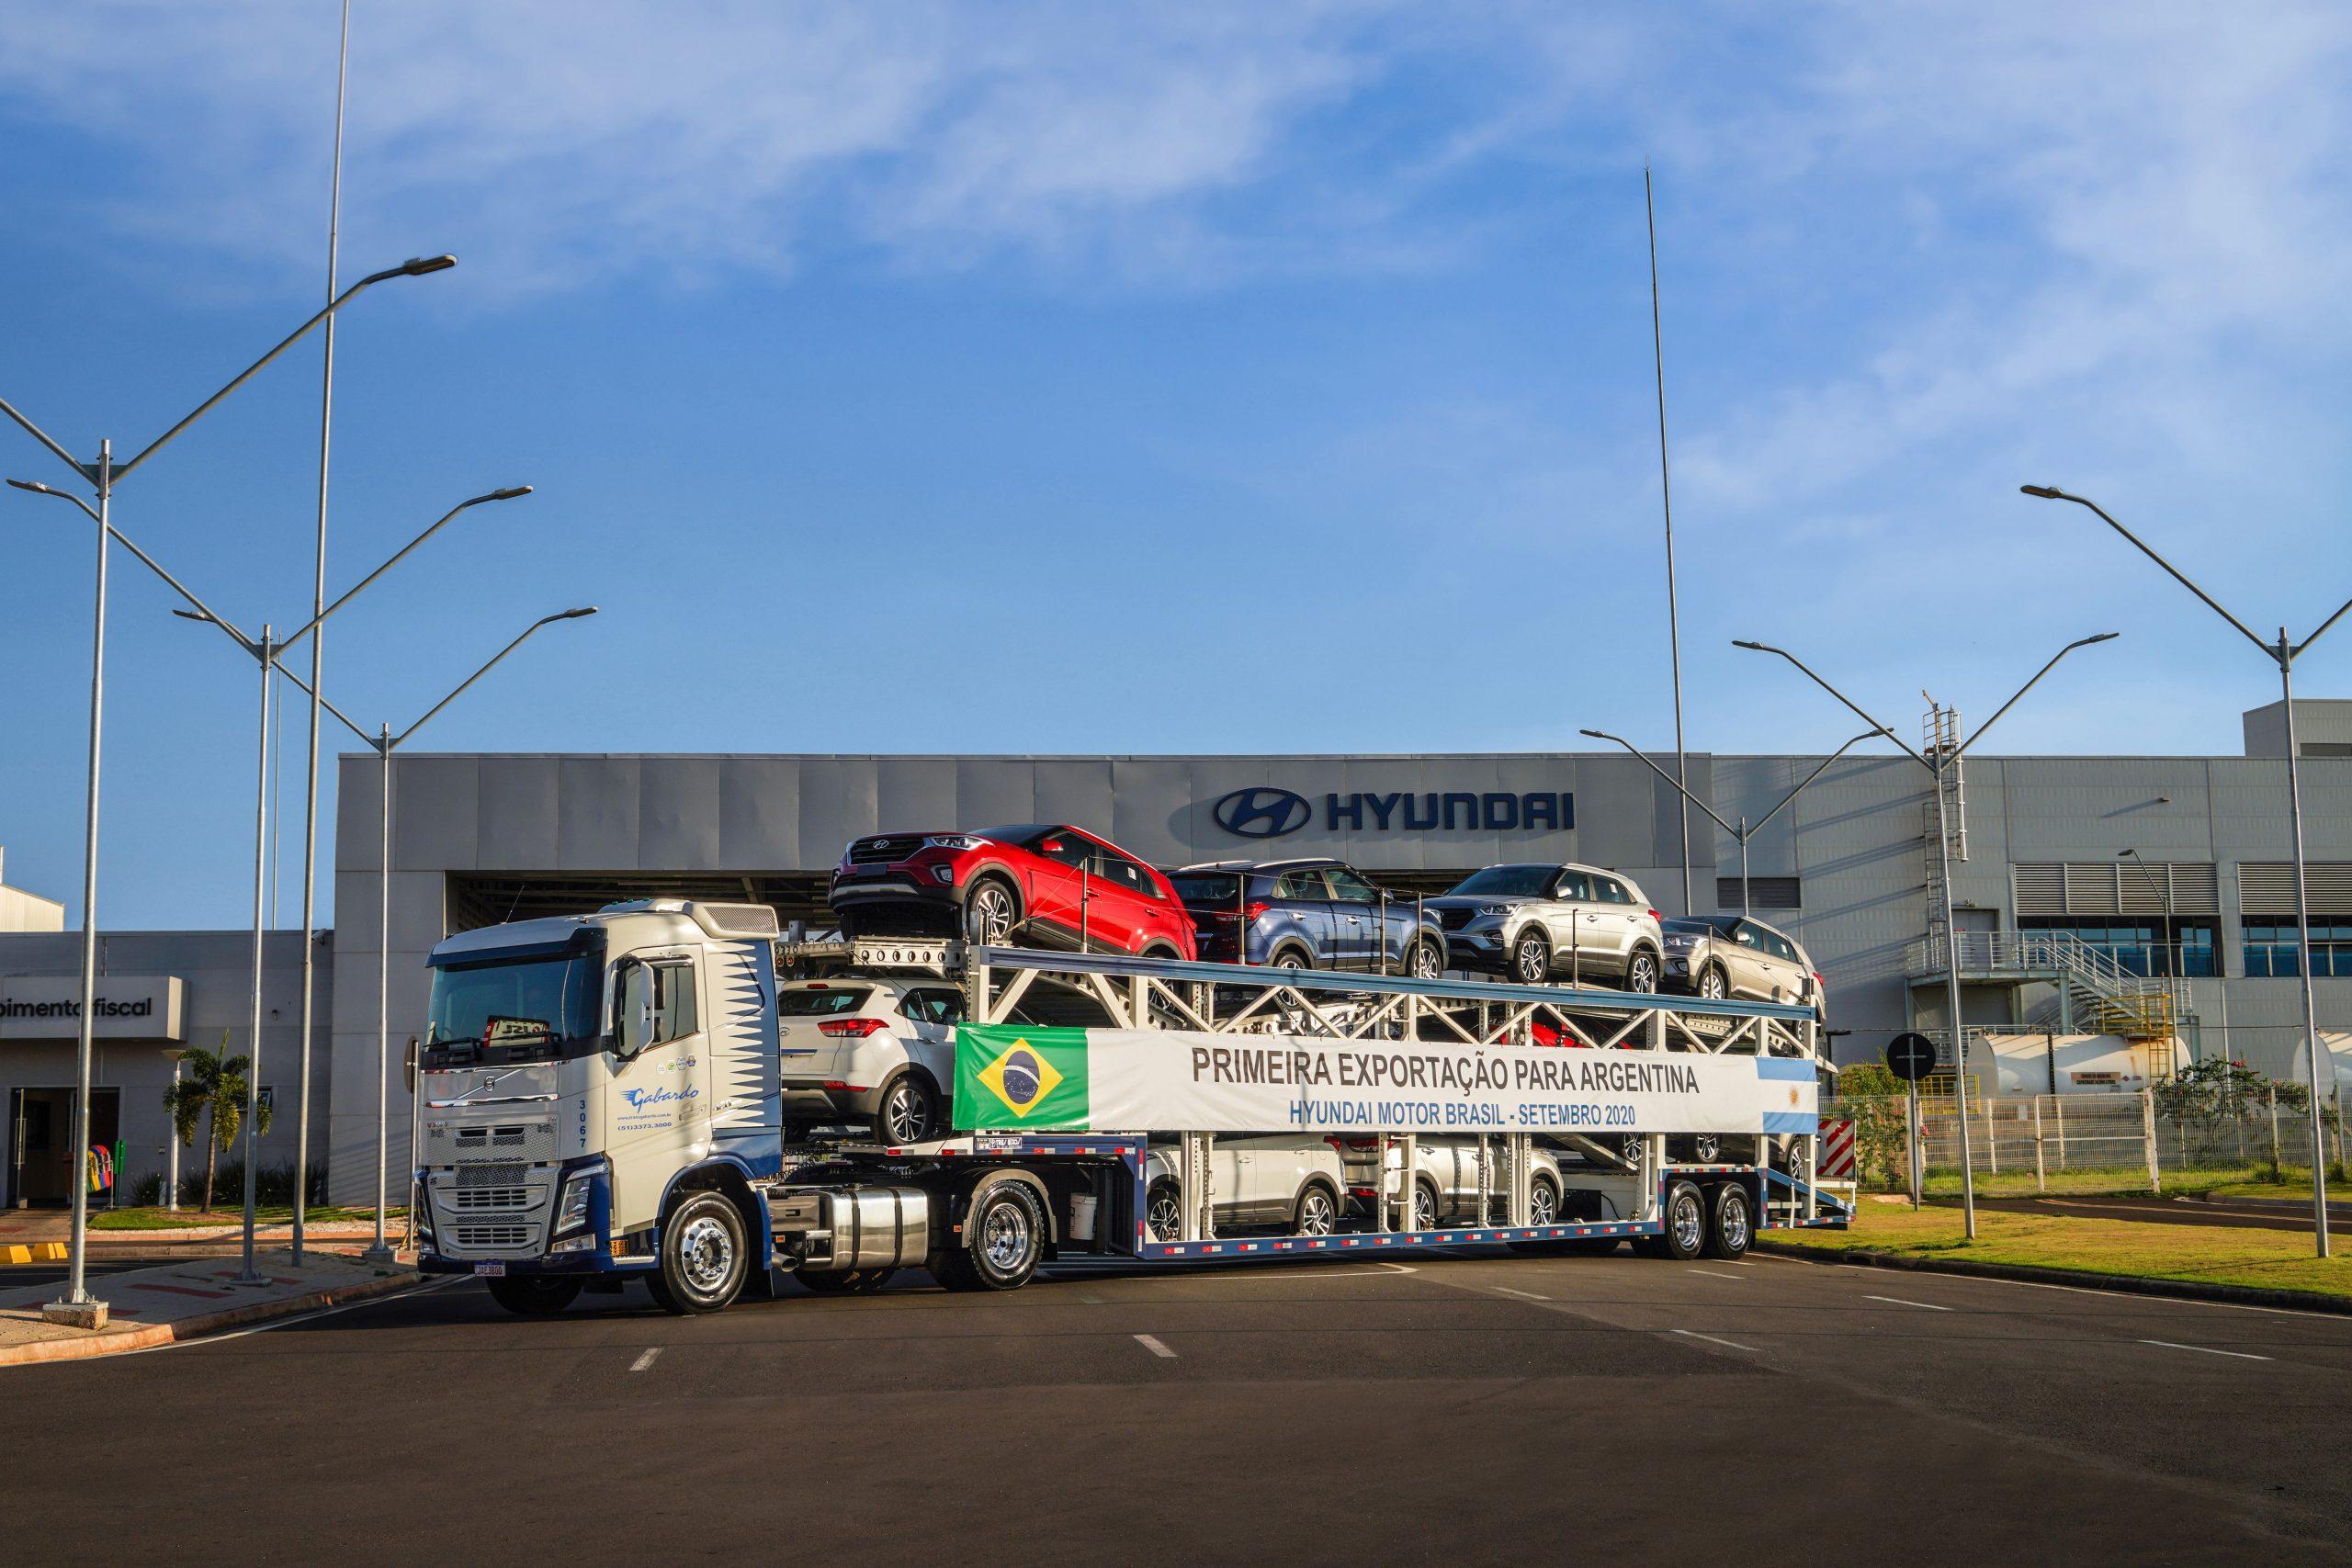 Hyundai começa a exportar carros do Brasil para a Argentina